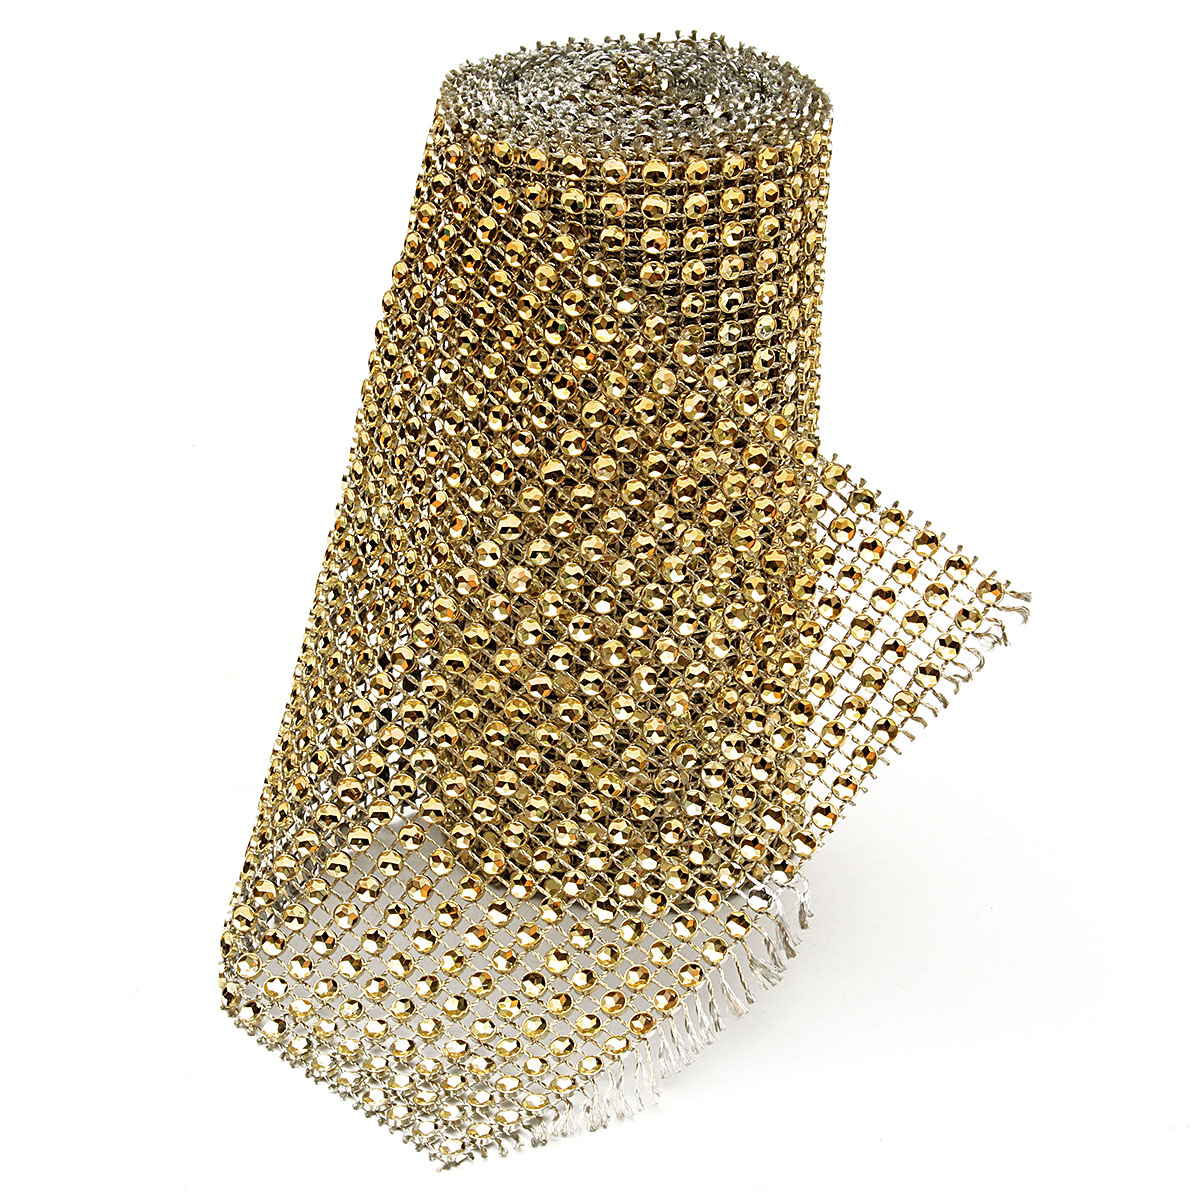 Silver Diamond Rhinestone Ribbon Wrap Bulk DIY Bling-Birthday/ Bridal Shower/Wedding Cake Vase Decorations, Party Supplies,2 Yards